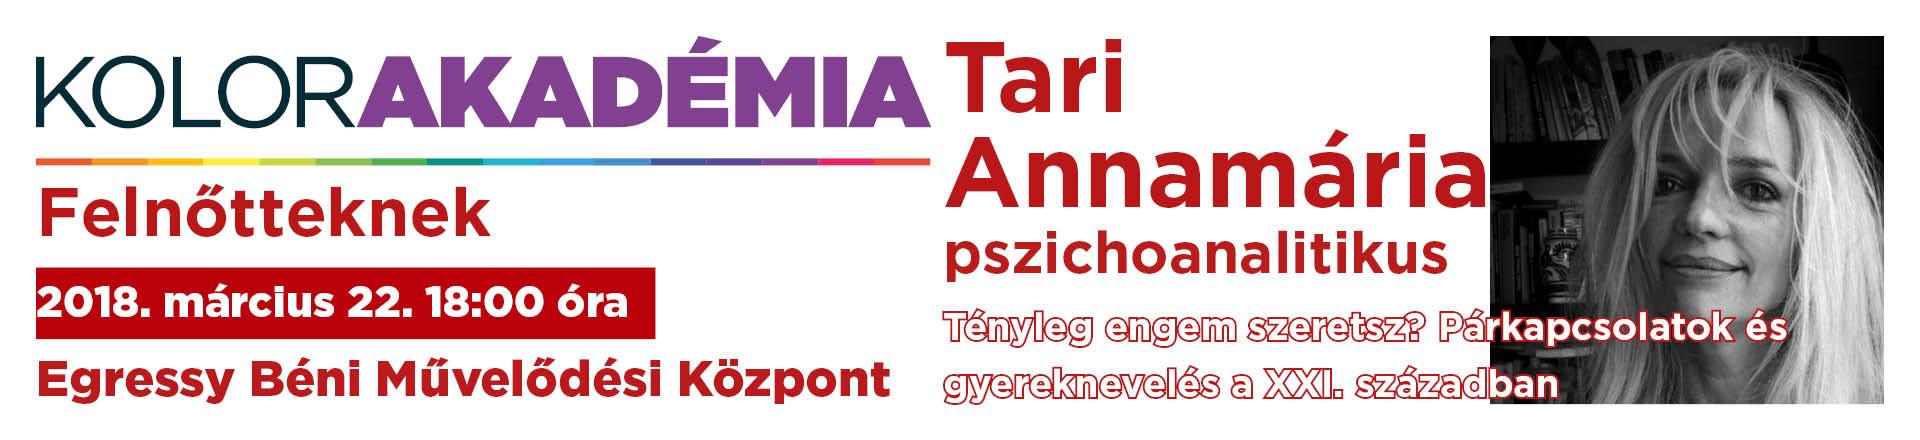 Tari Annamária